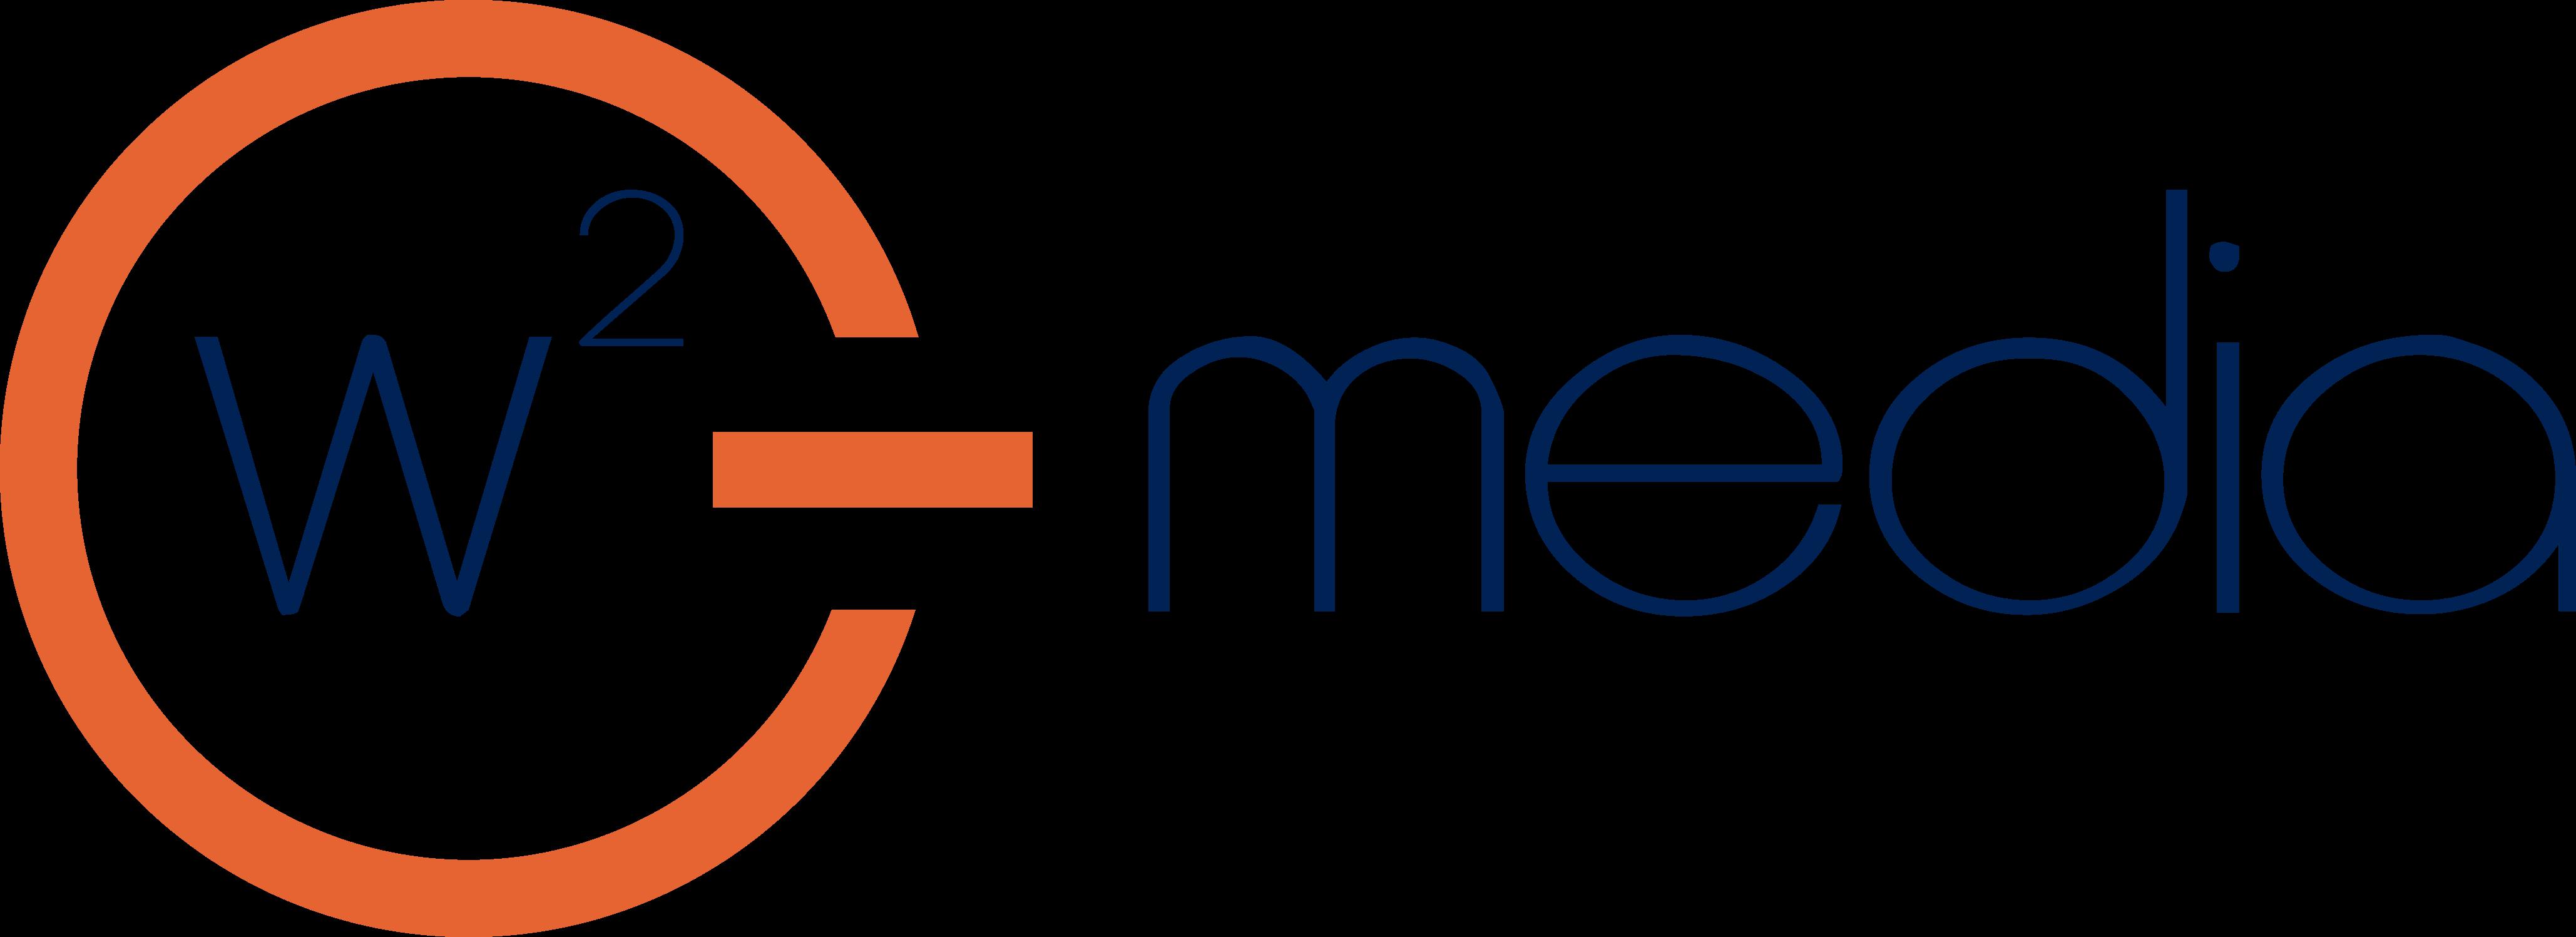 w2media